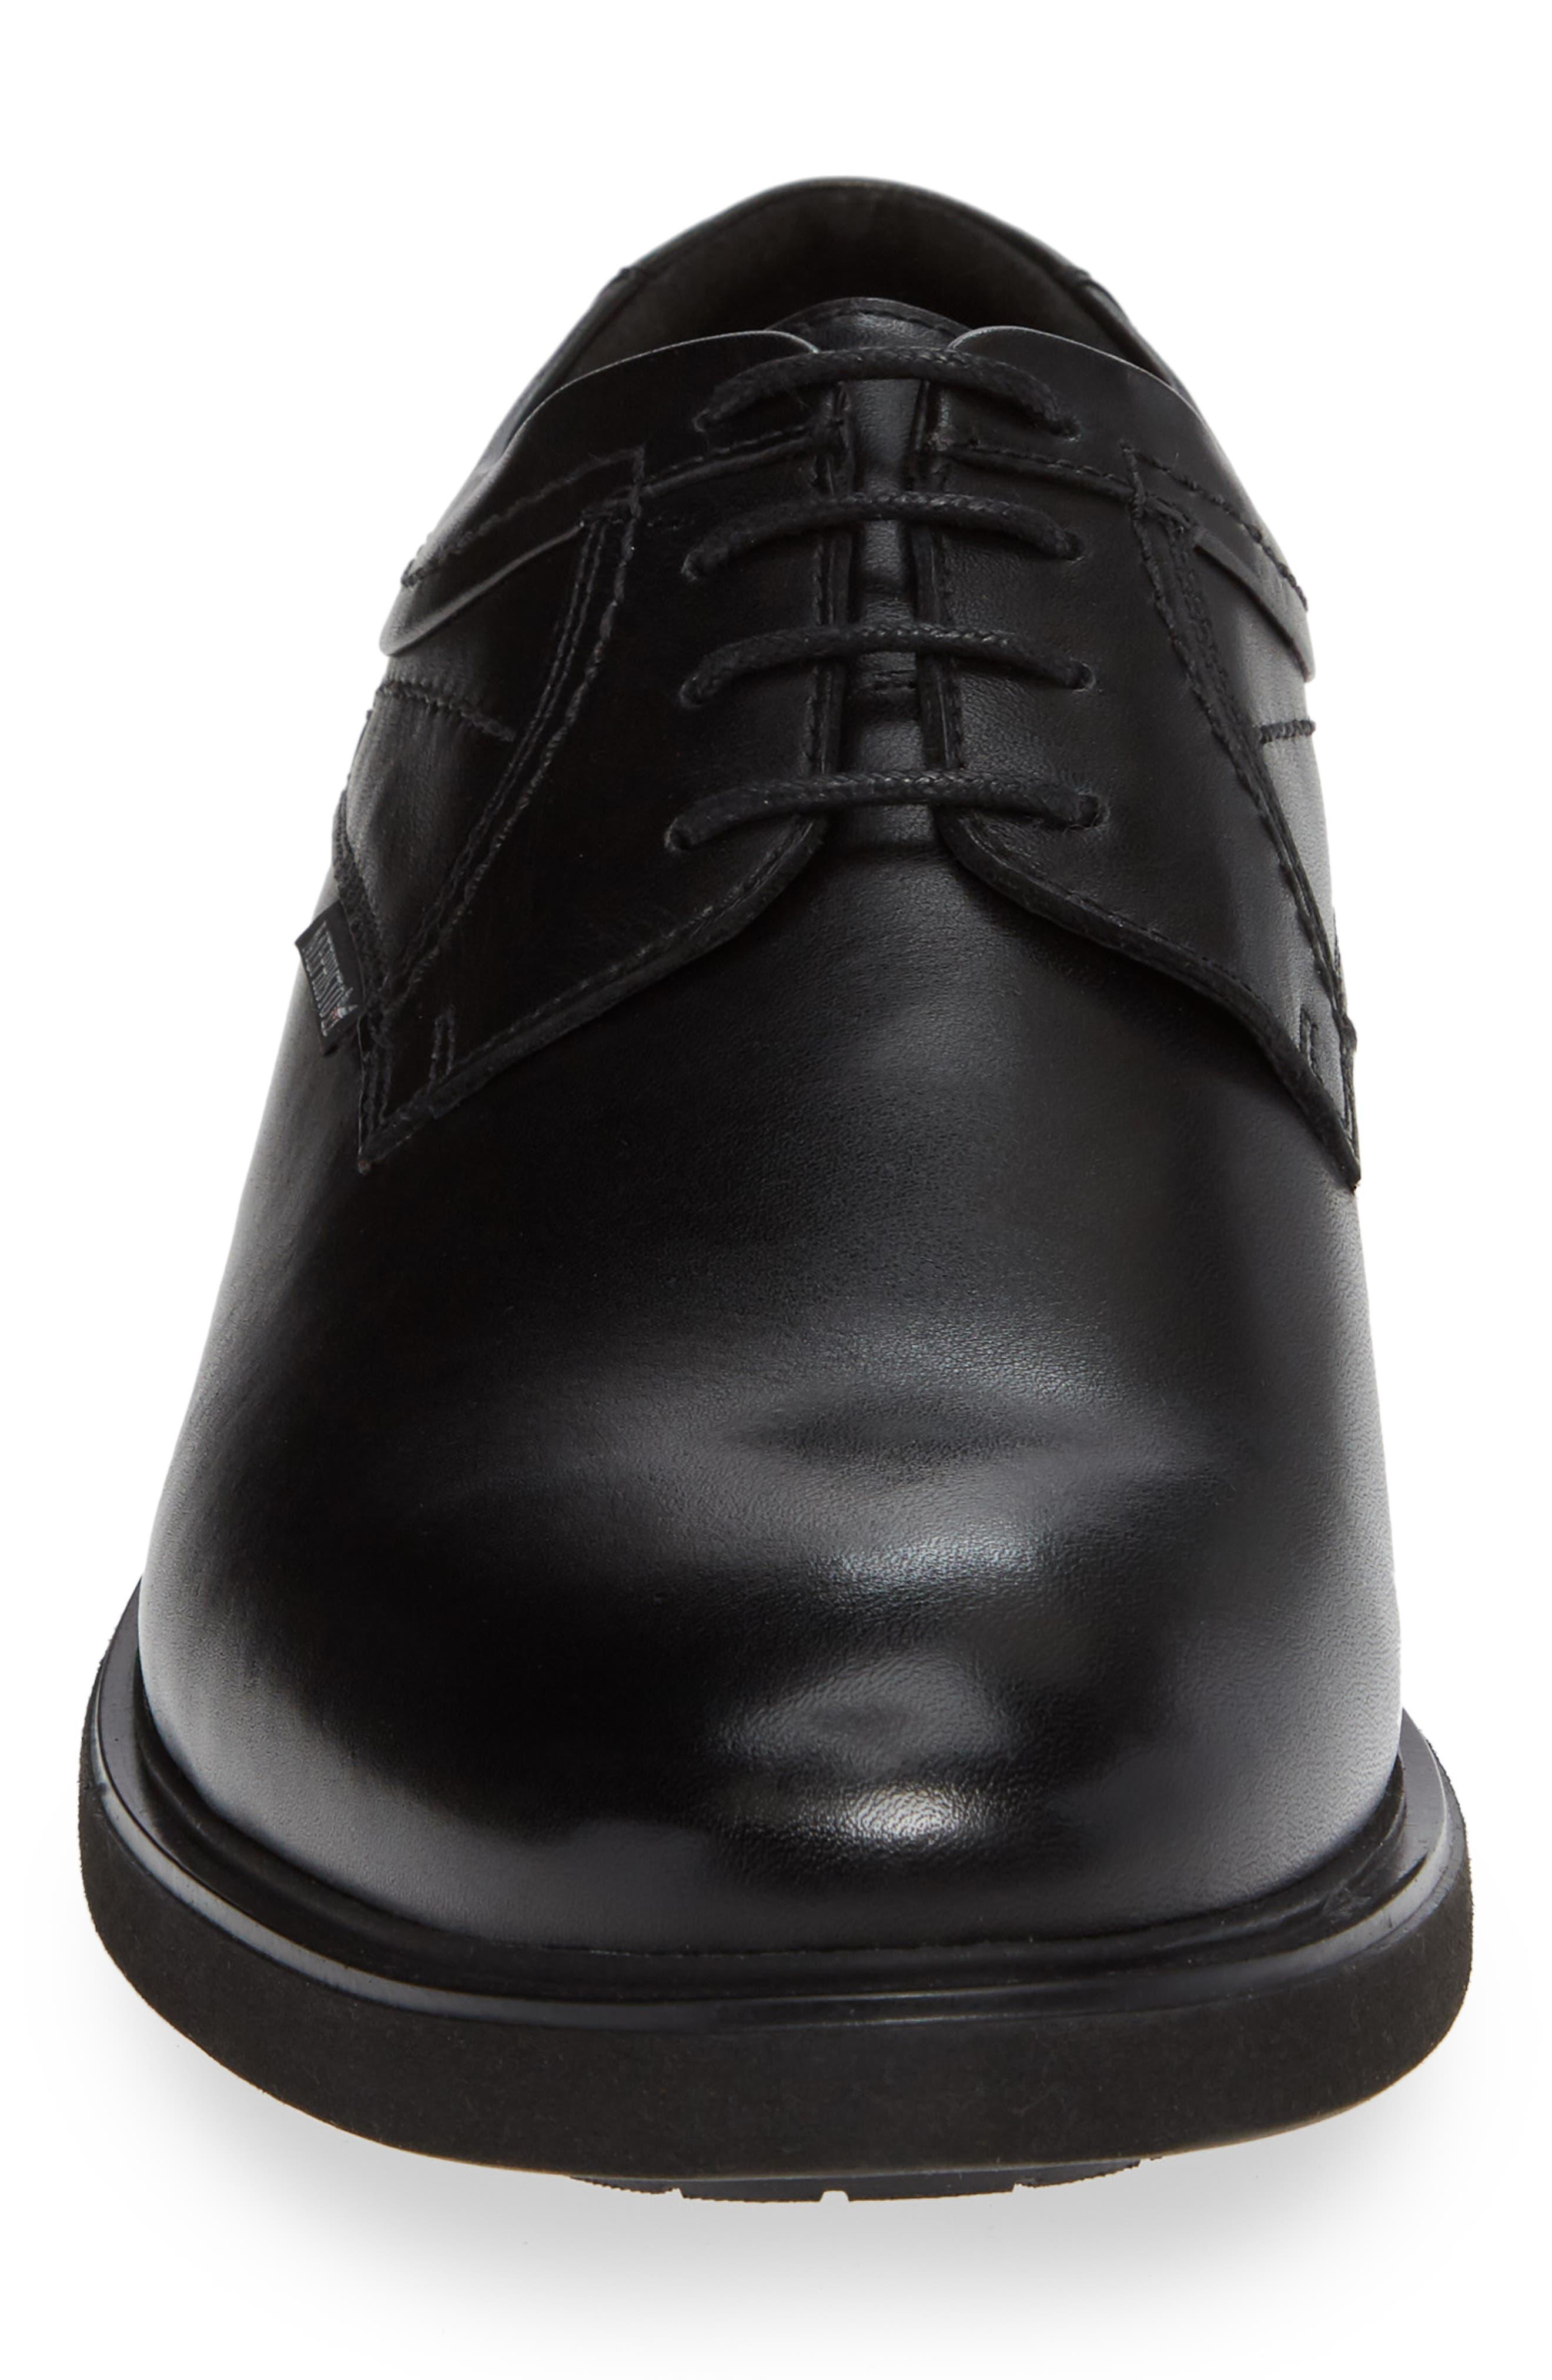 MEPHISTO, Olivio Plain Toe Derby, Alternate thumbnail 4, color, BLACK LEATHER